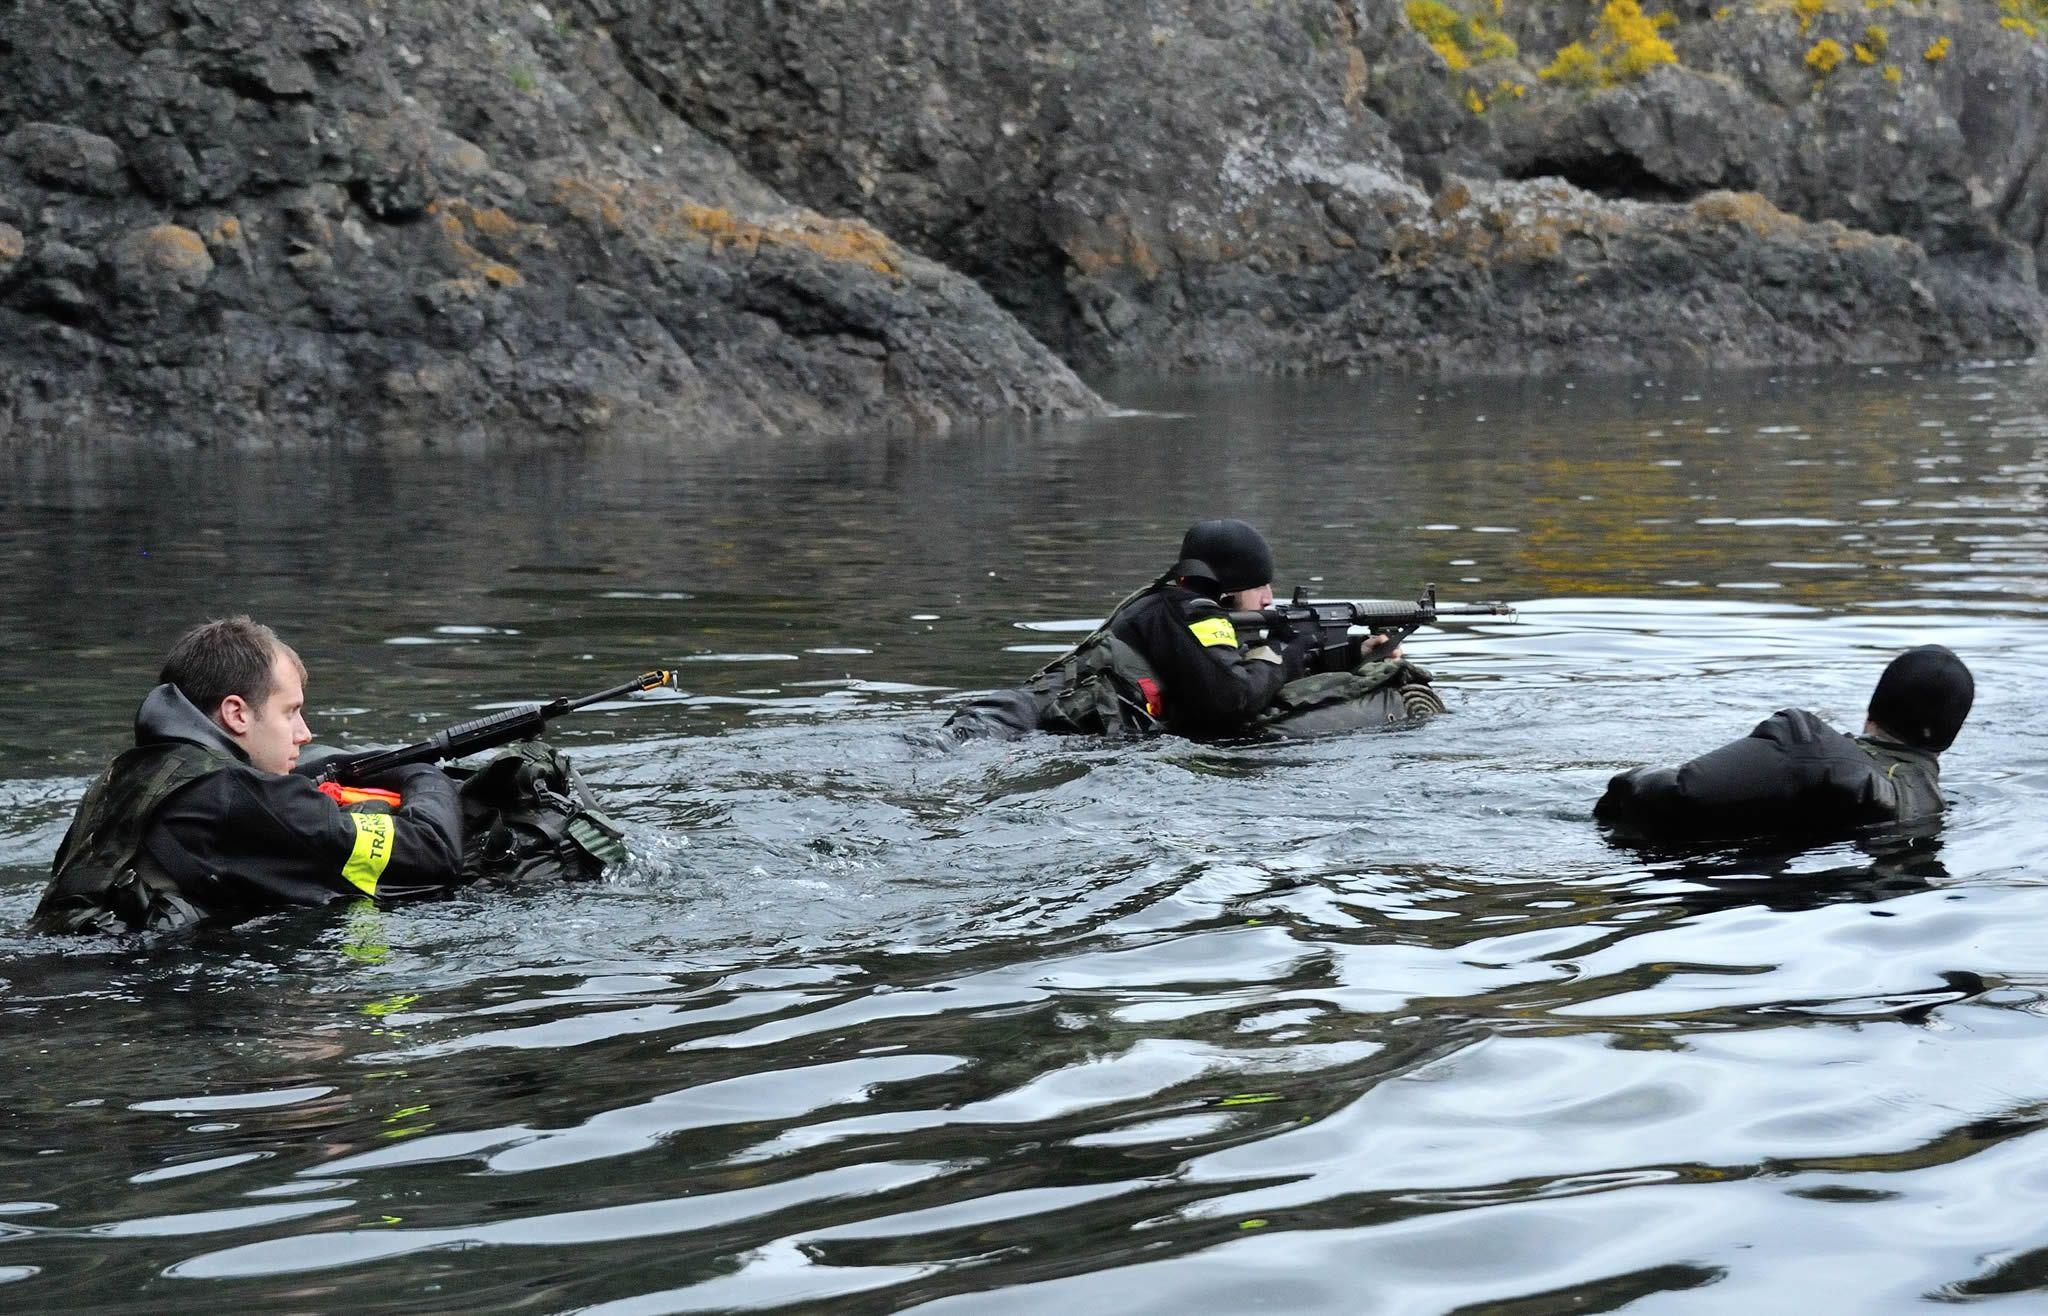 Near Canadian Forces Base Esquimalt, British Columbia. 16